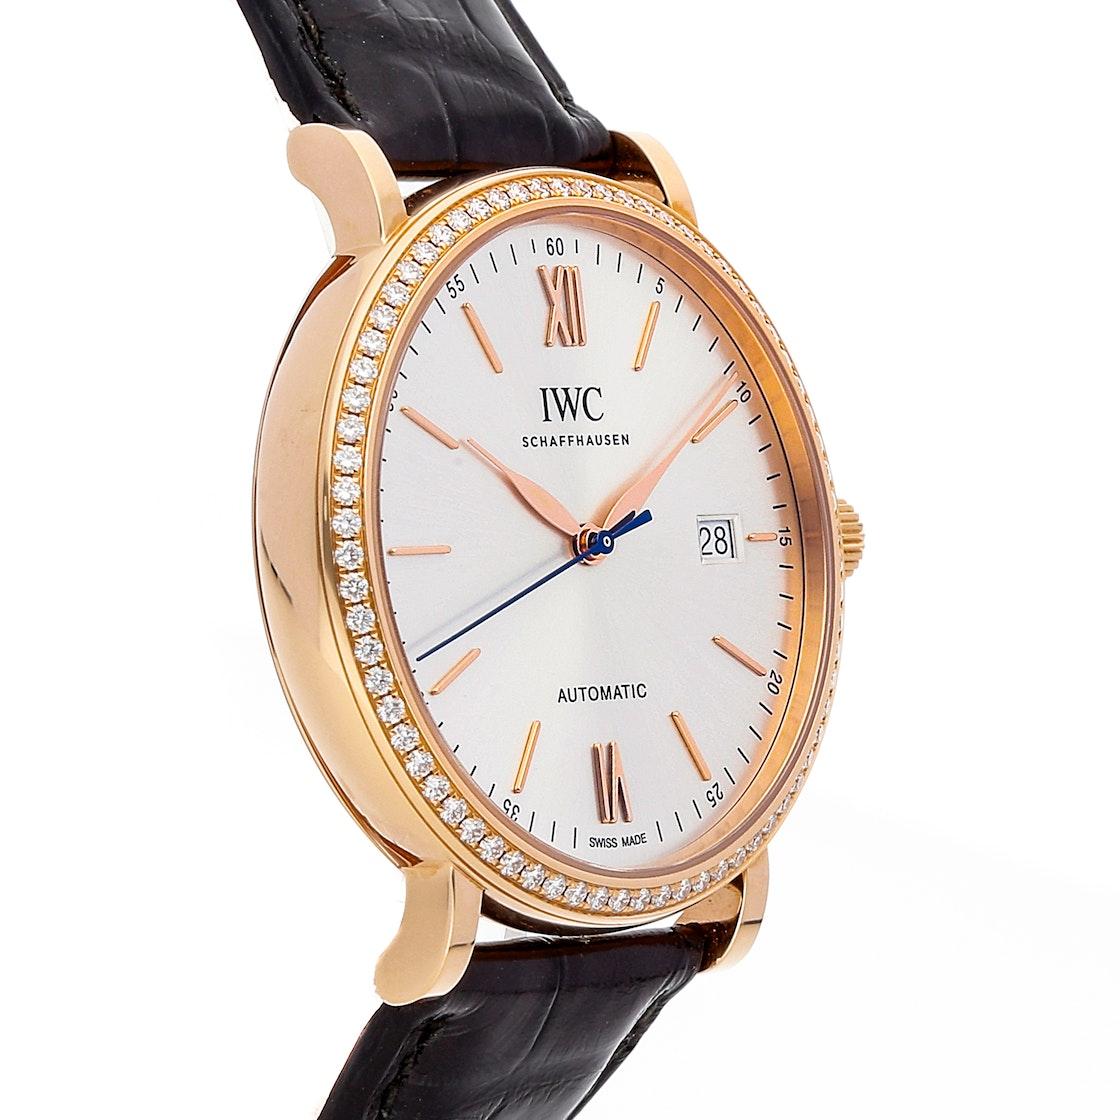 IWC Portofino IW3565-15